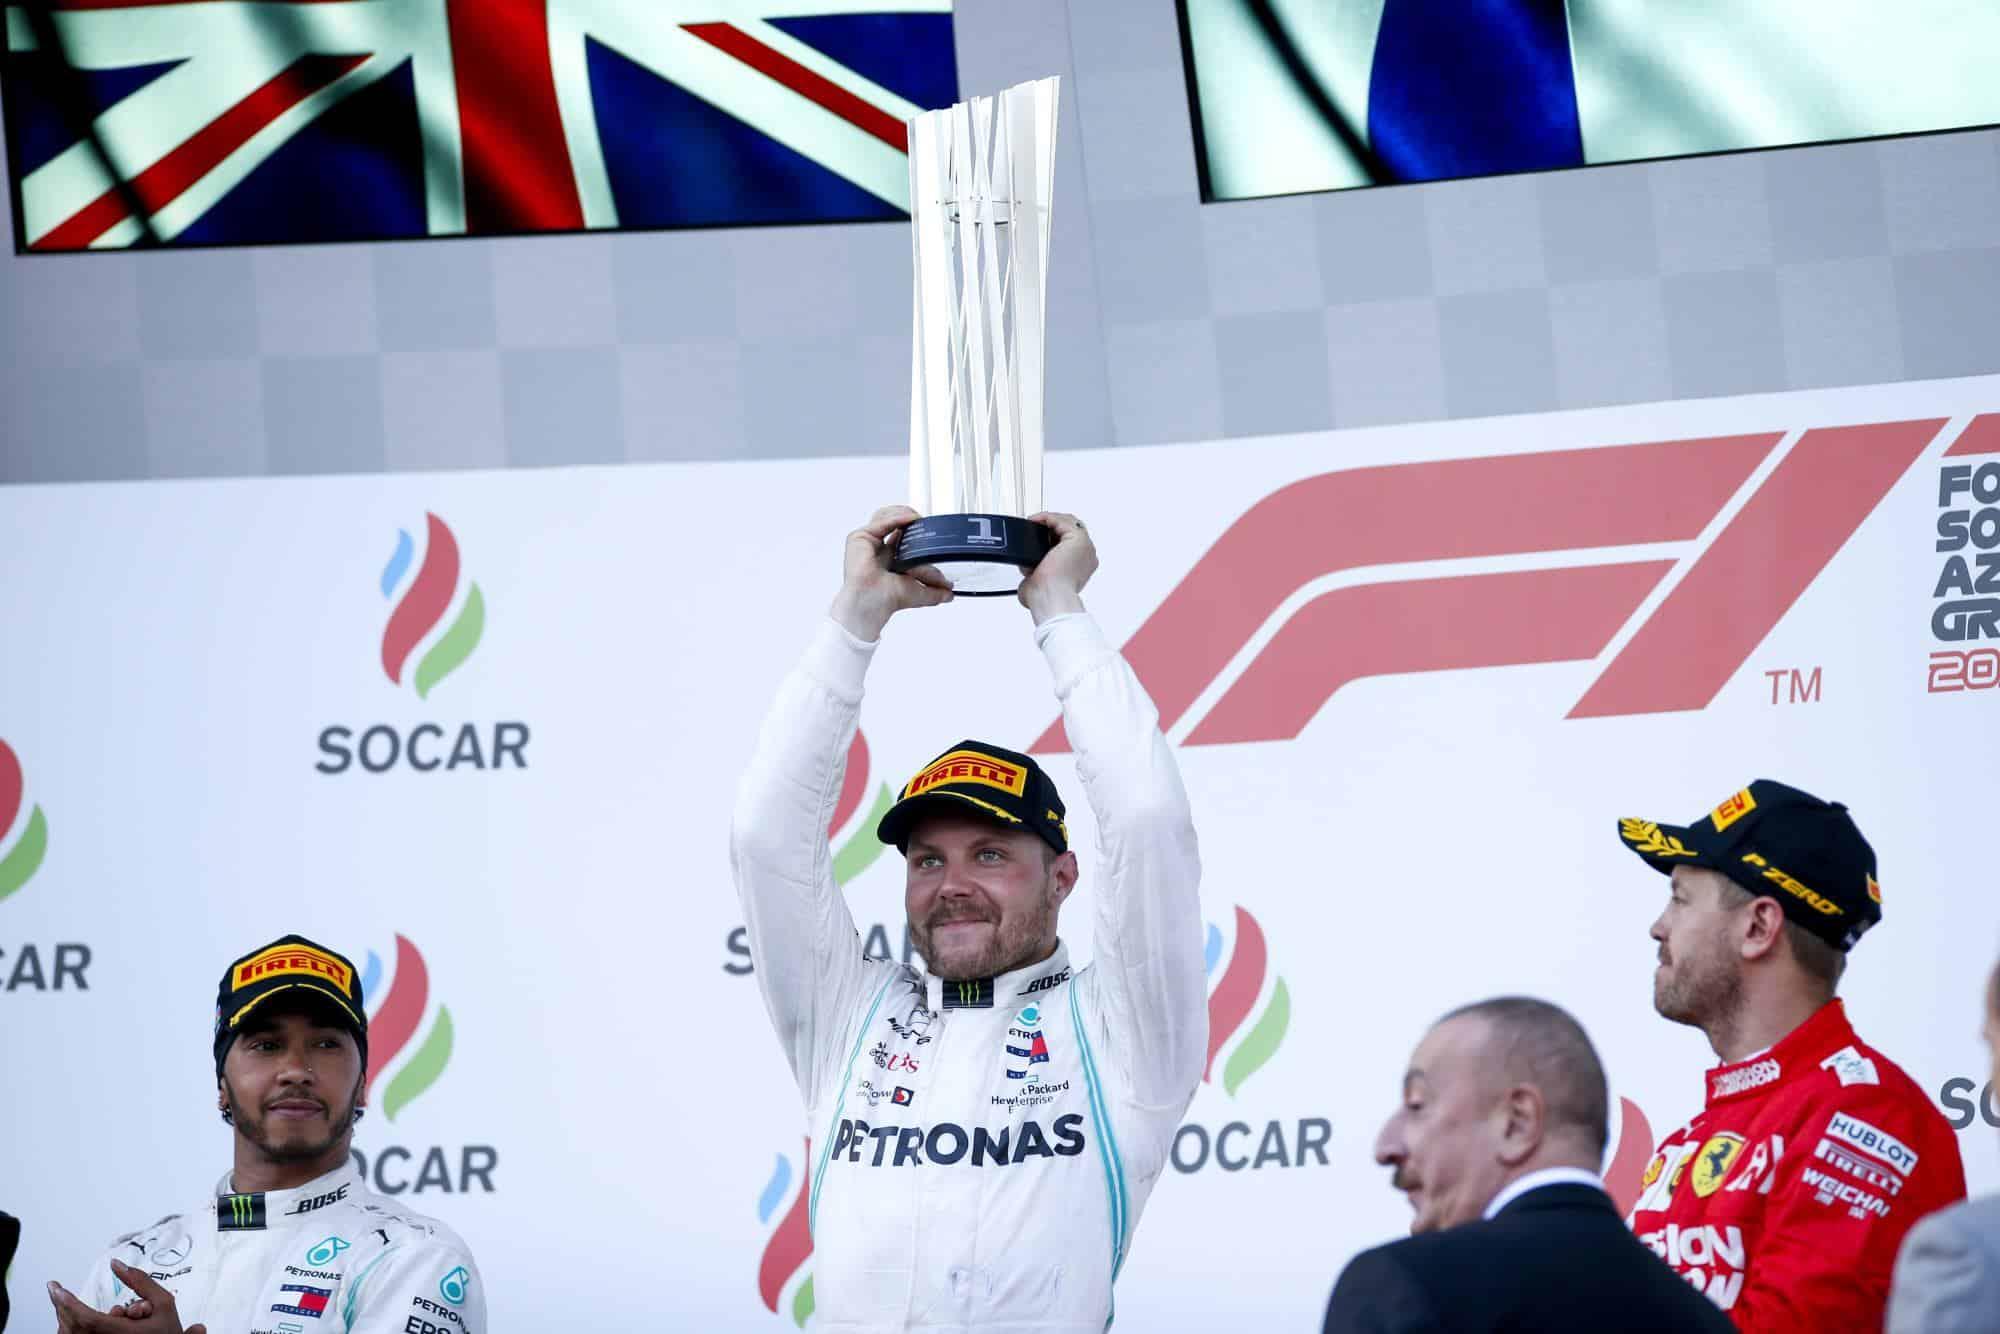 2019 Azerbaijan GP F1 podium Bottas Hamilton Vettel Photo Daimler